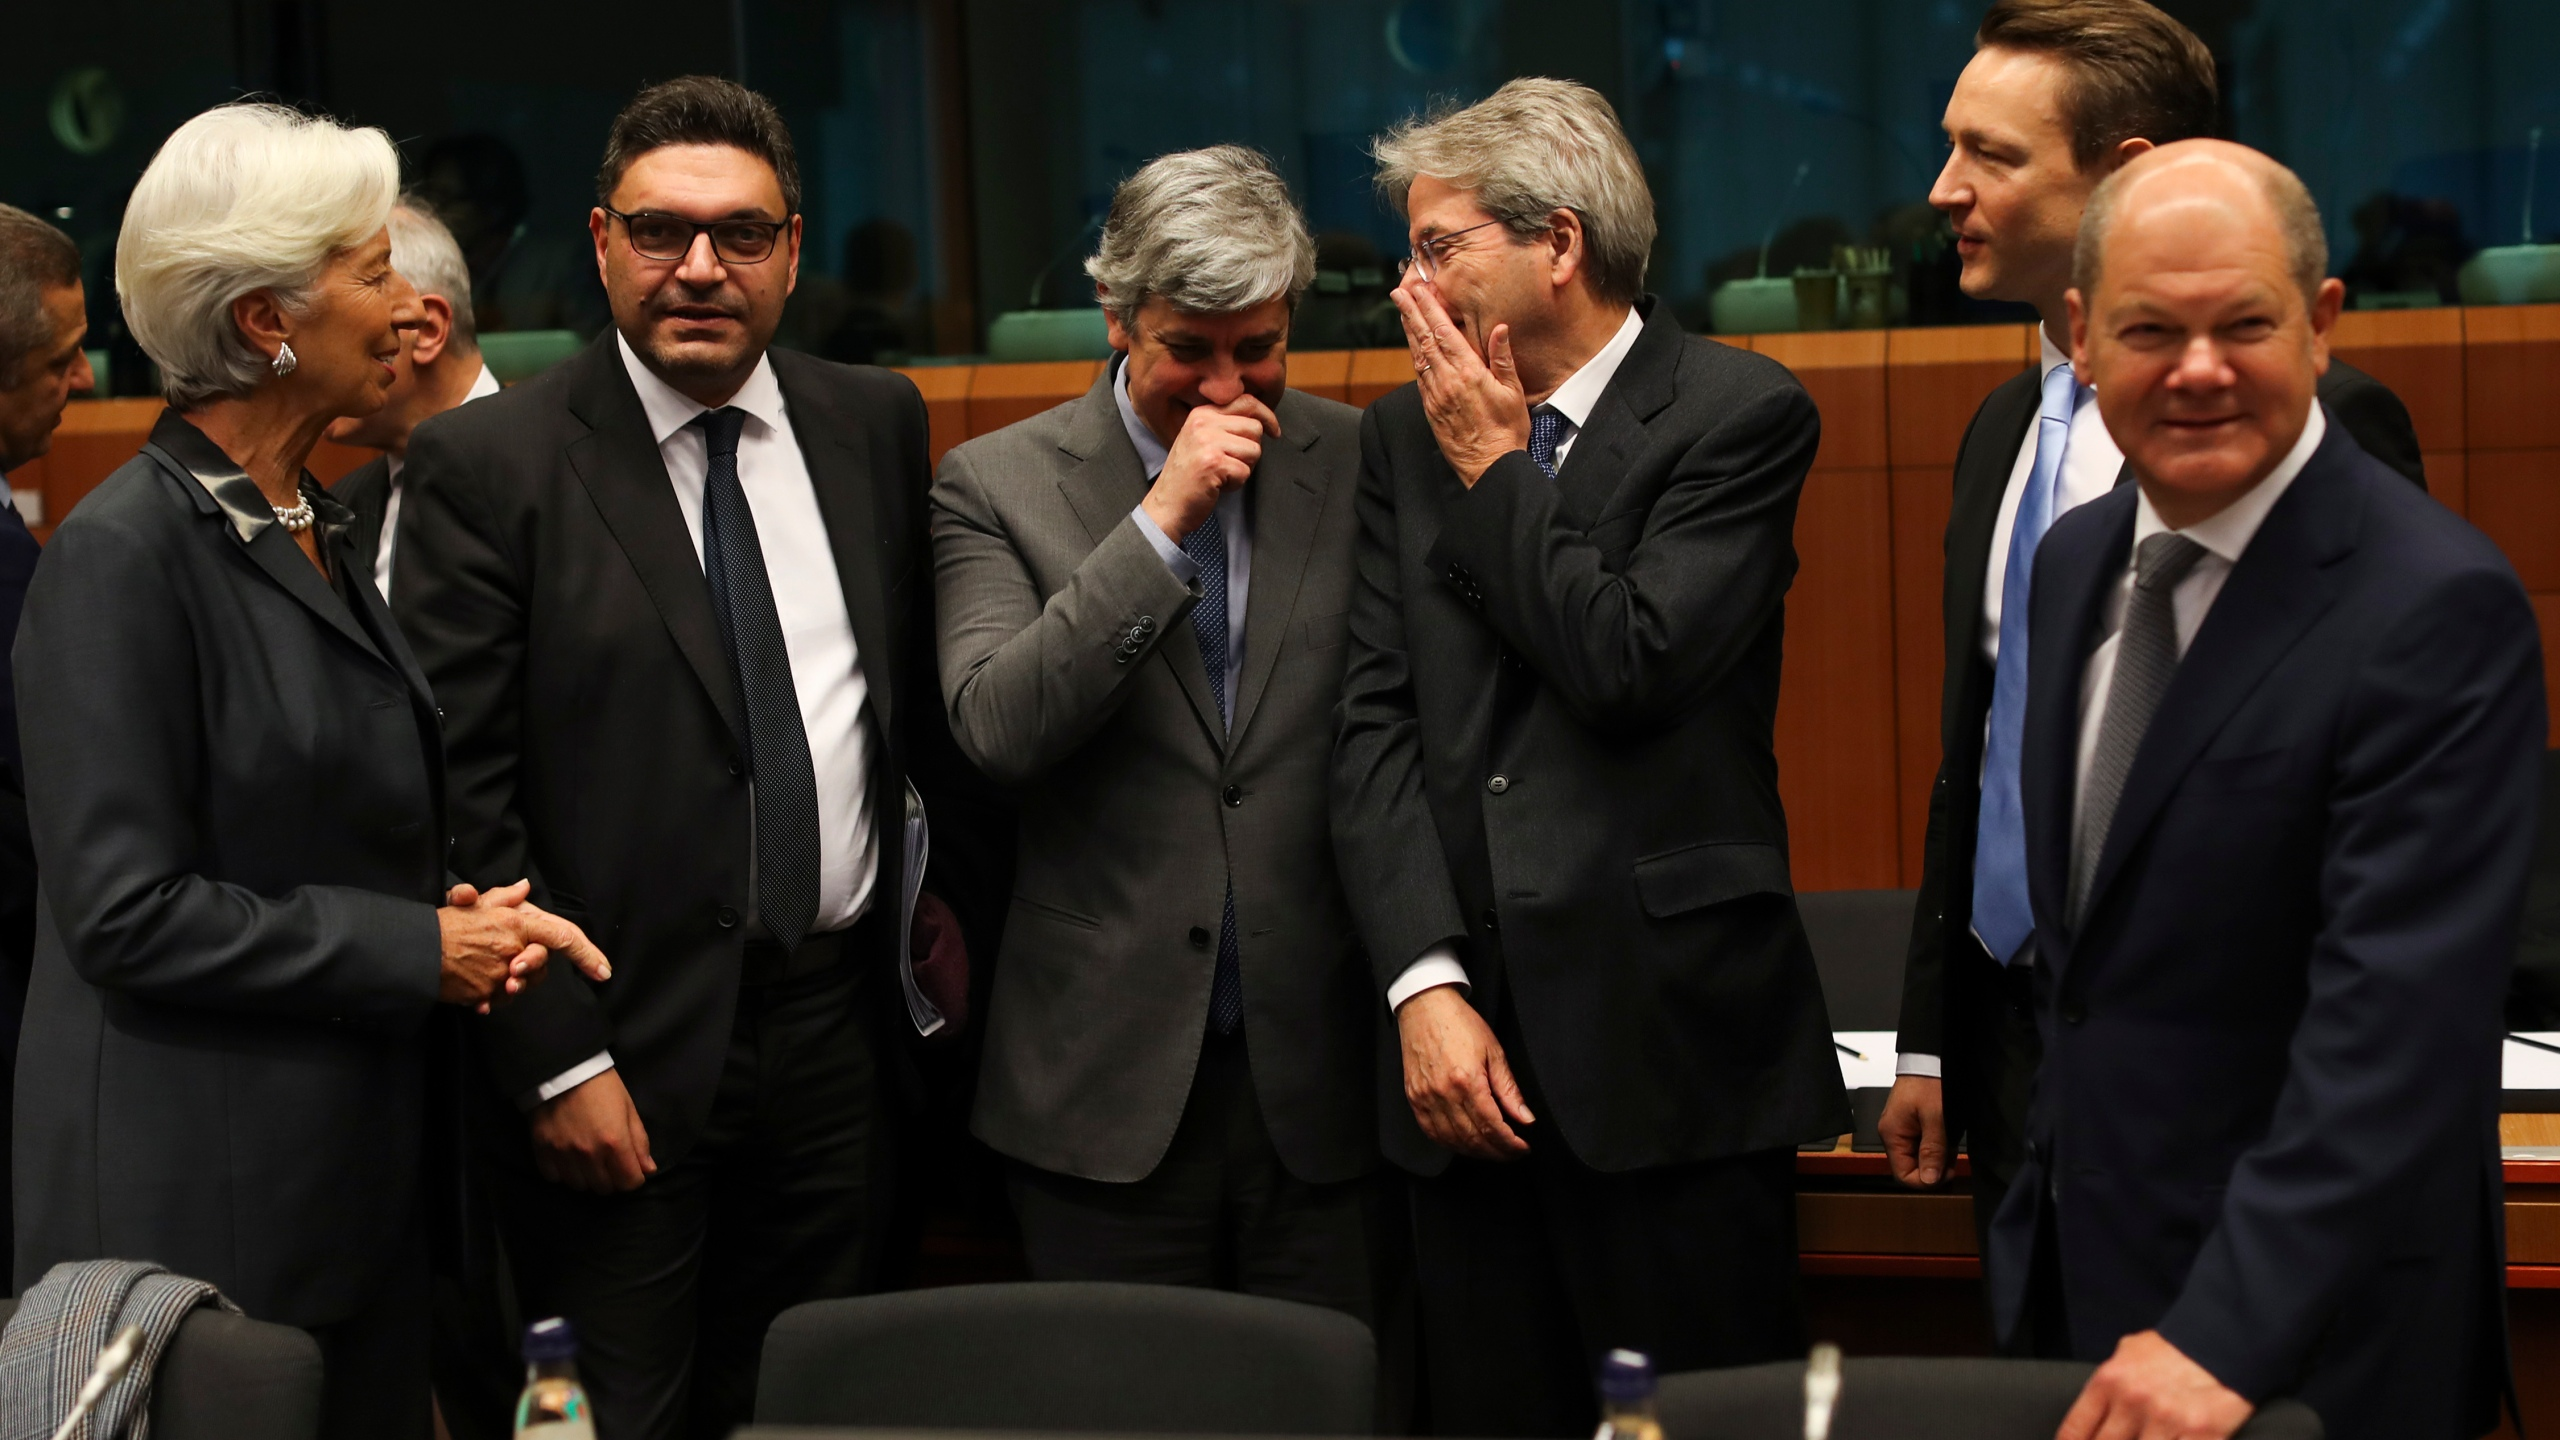 Christine Lagarde, Constantinos Petrides, Mario Centeno, Paolo Gentiloni, Gernot Blumel, Olaf Scholz